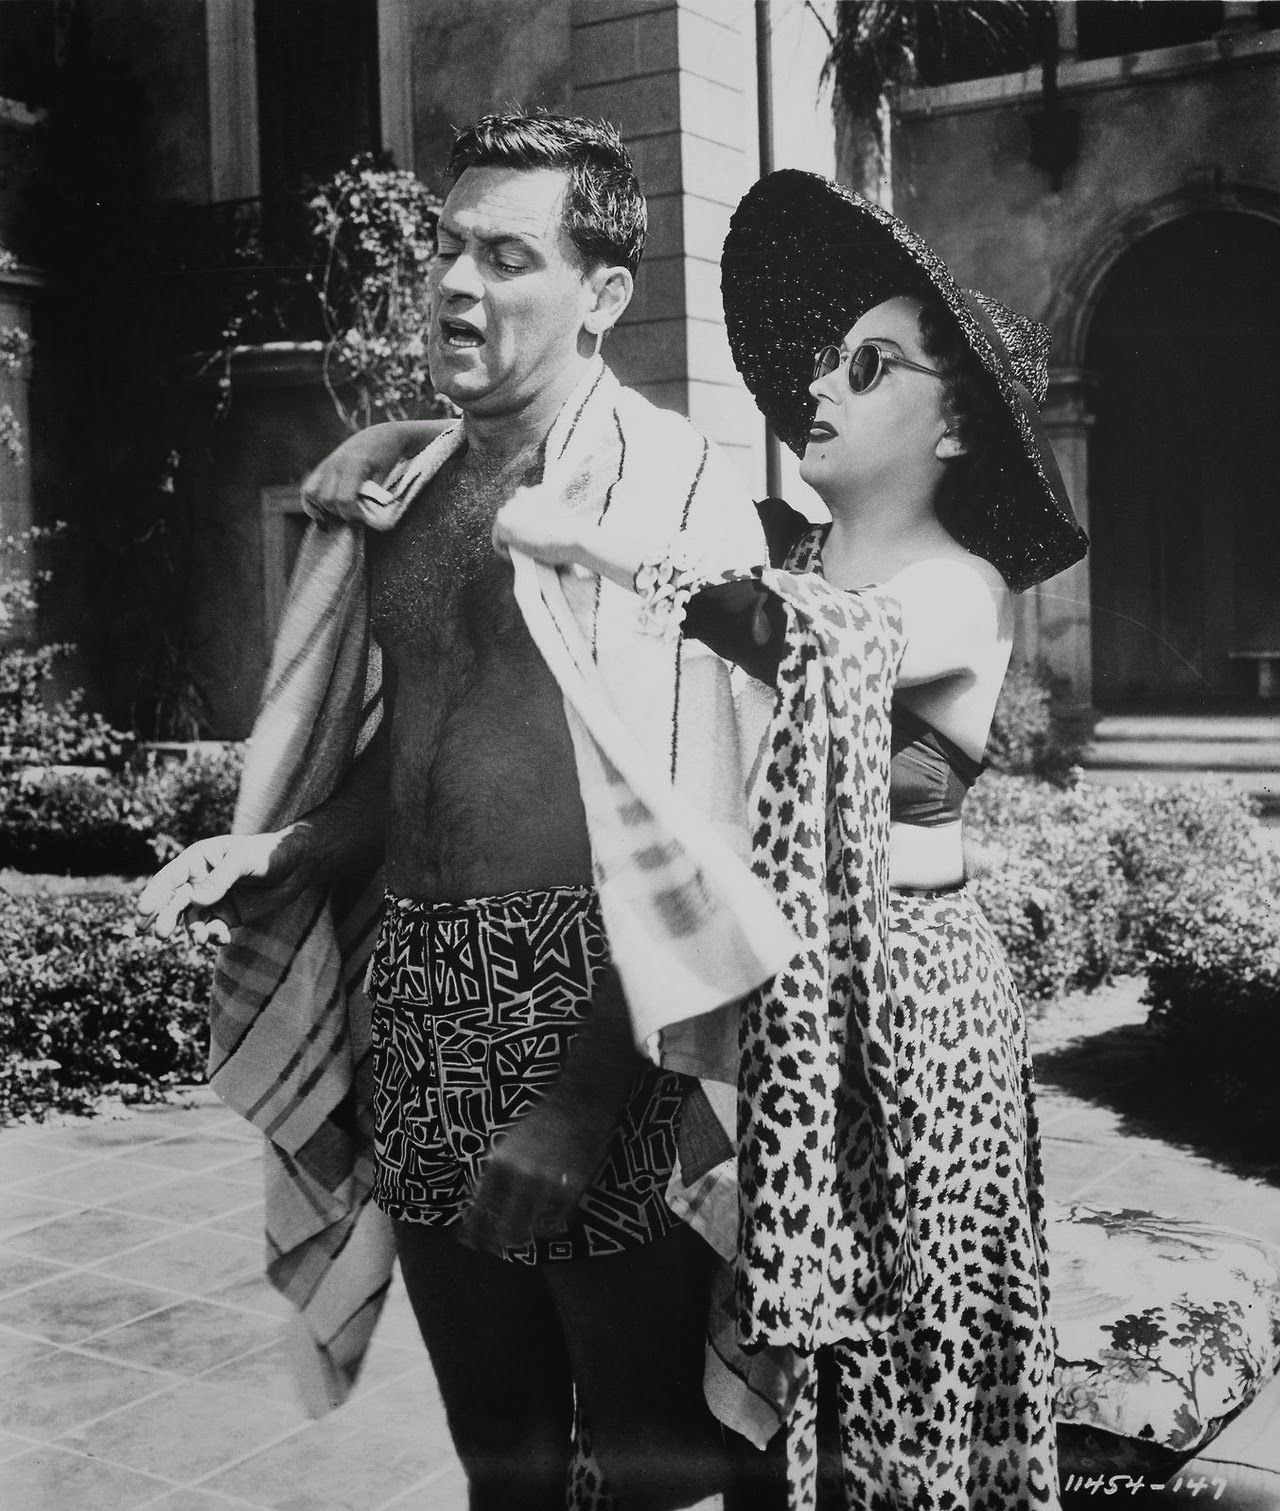 7 William Holden & Gloria Swanson (Sunset boulevard).jpg (imagem JPEG, 1280 × 1511 pixels)